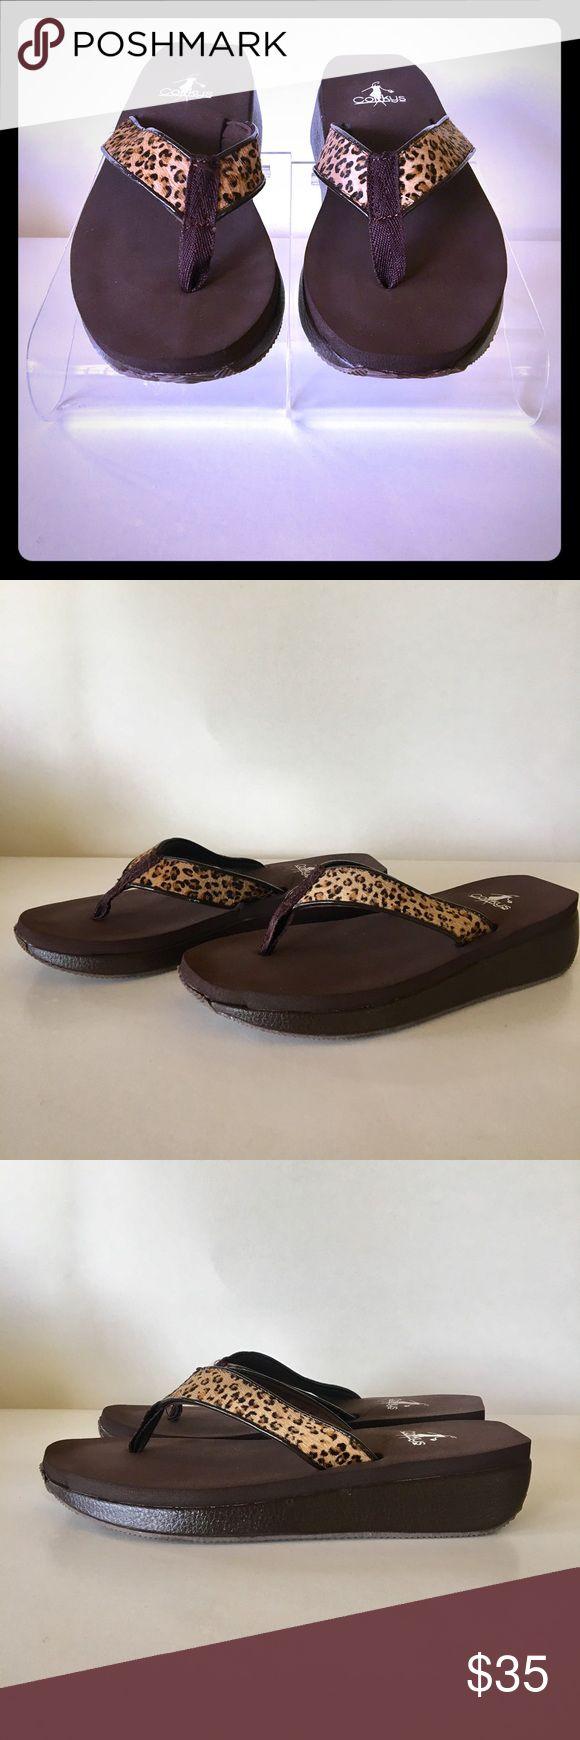 Women's cheetah hair wedge thing sandal Women's cheetah hair wedge thong sandal Shoes Sandals